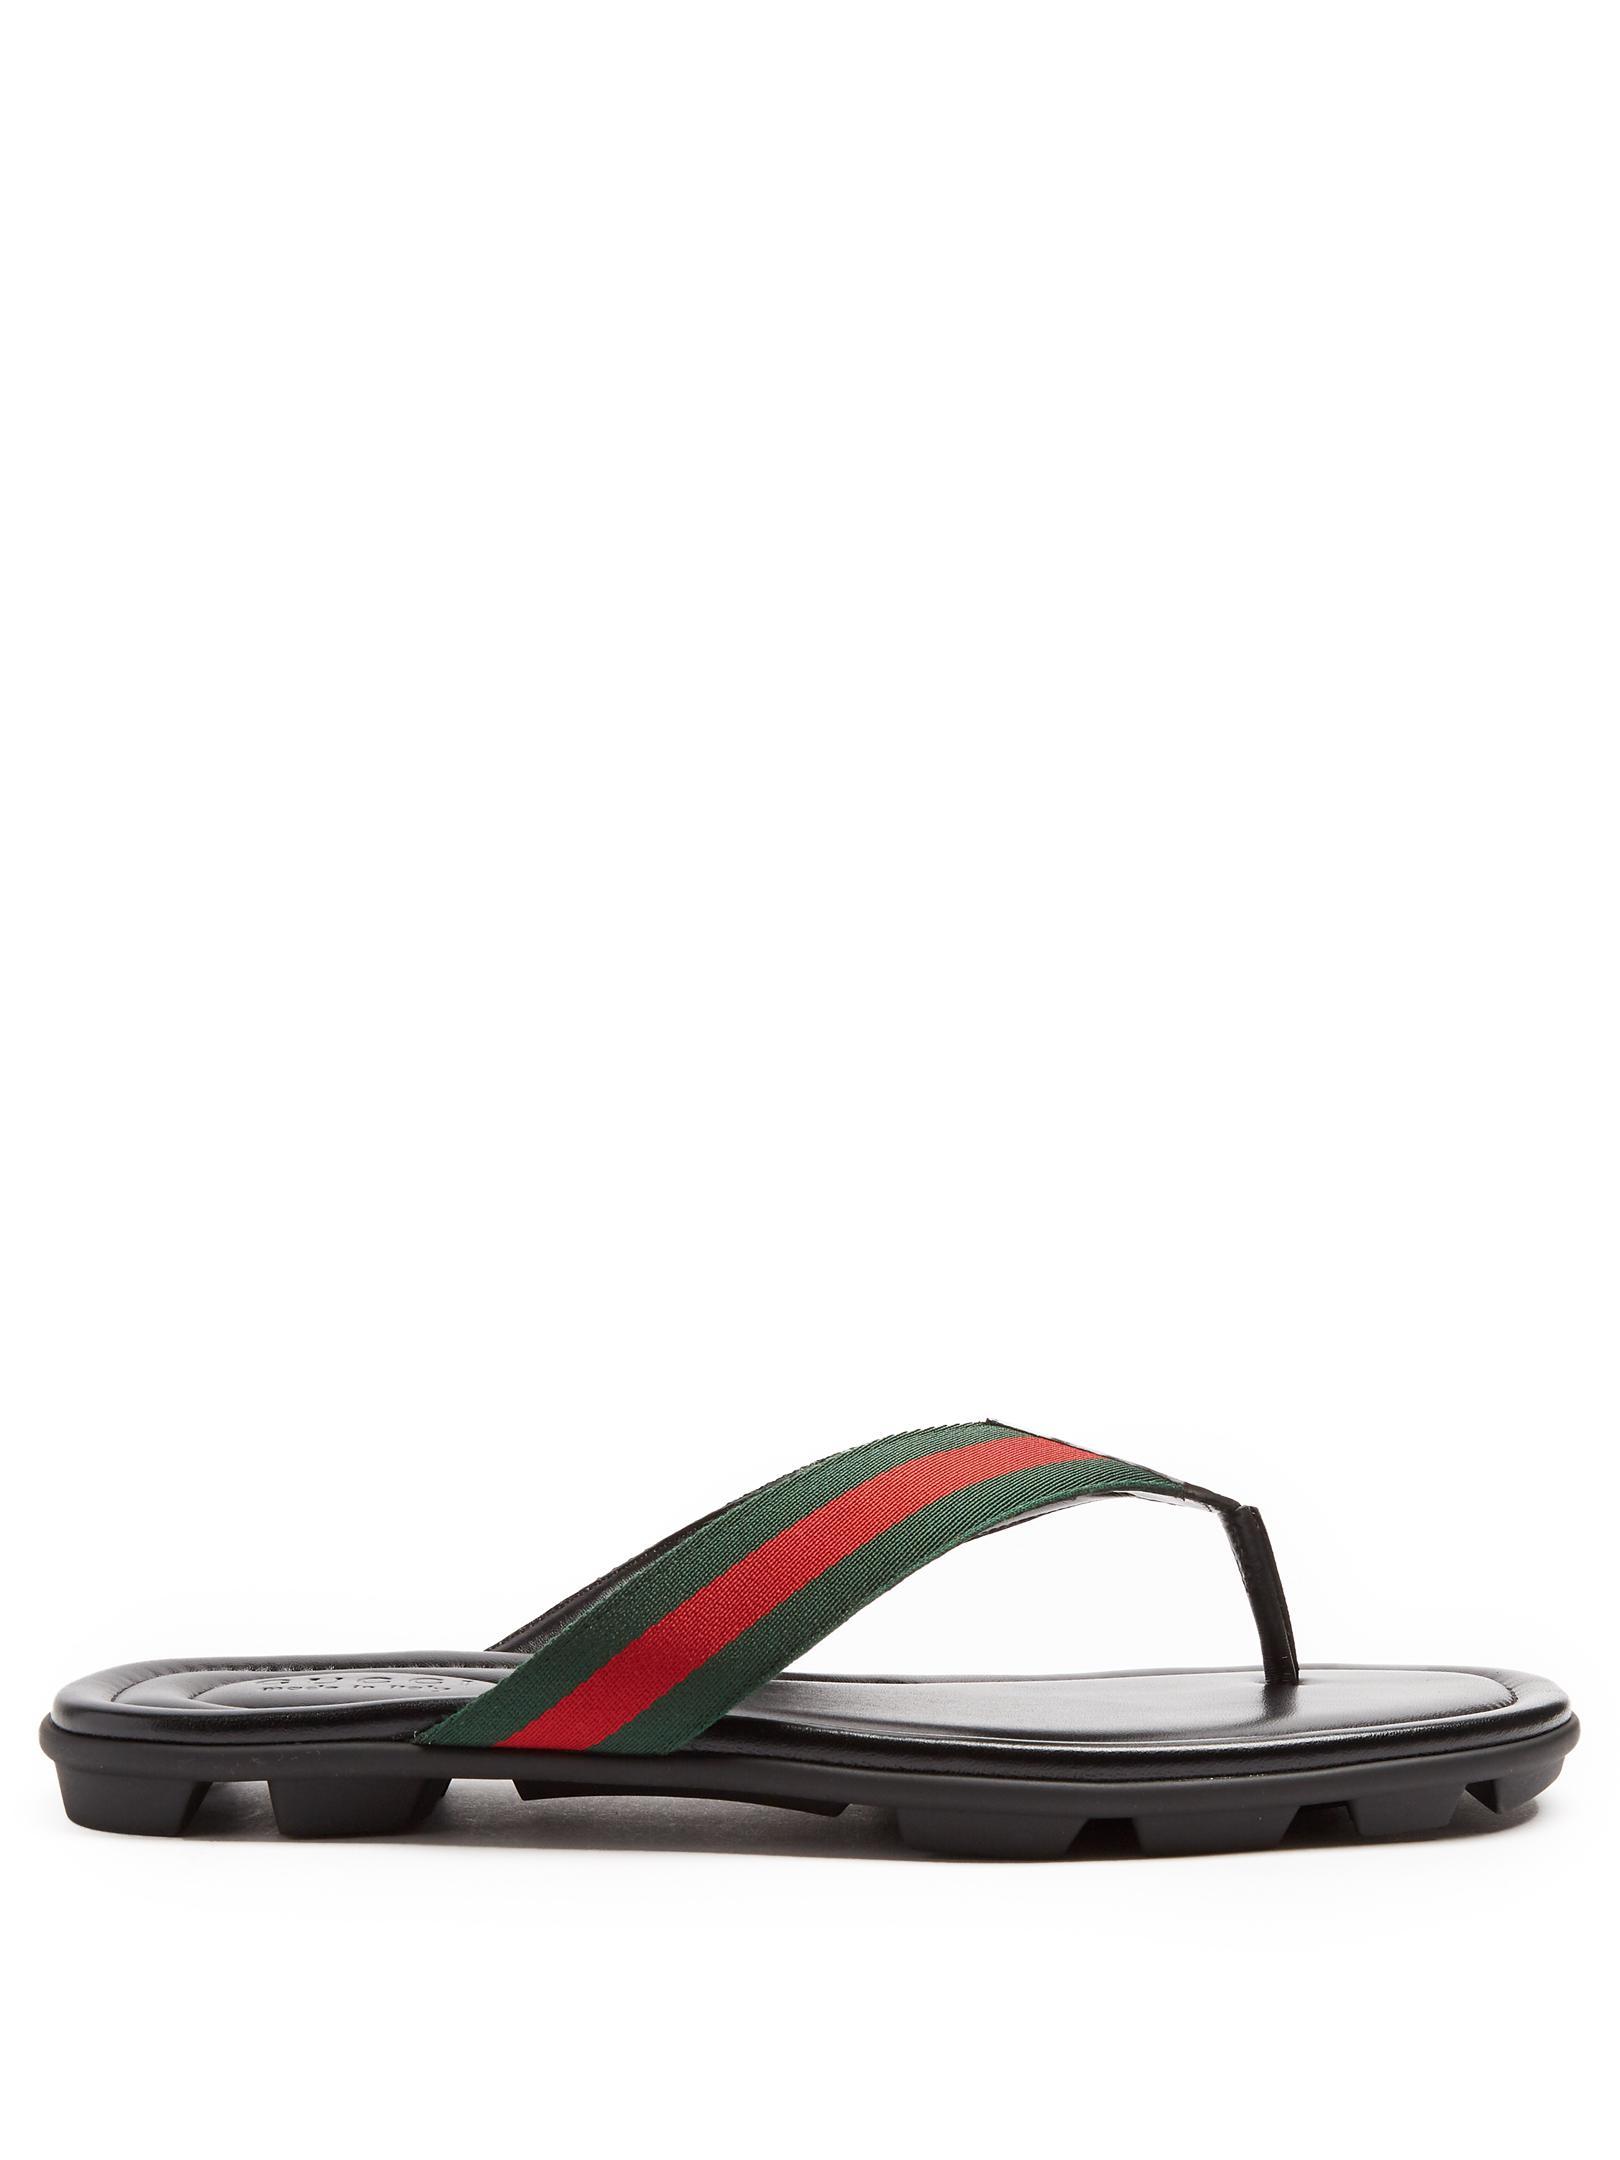 0bd4e5c886d9e4 Lyst - Gucci Titan Web-striped Flip-flops in Black for Men